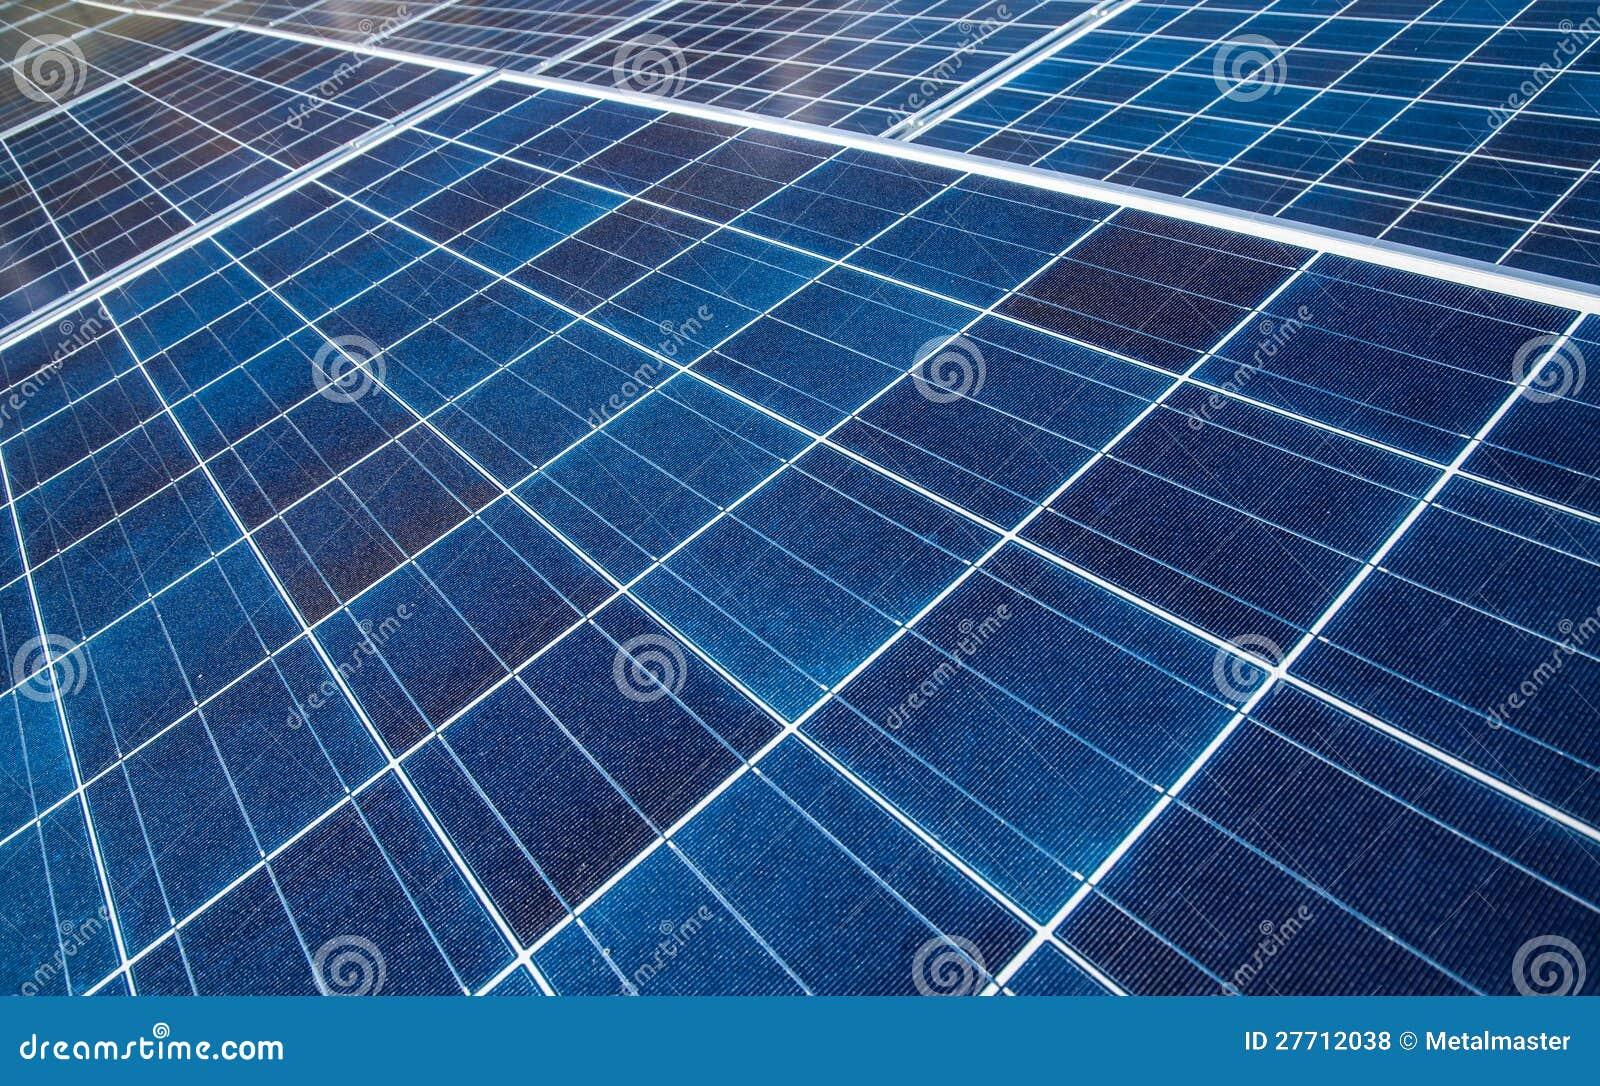 Solar Panels Royalty Free Stock Photos Image 27712038